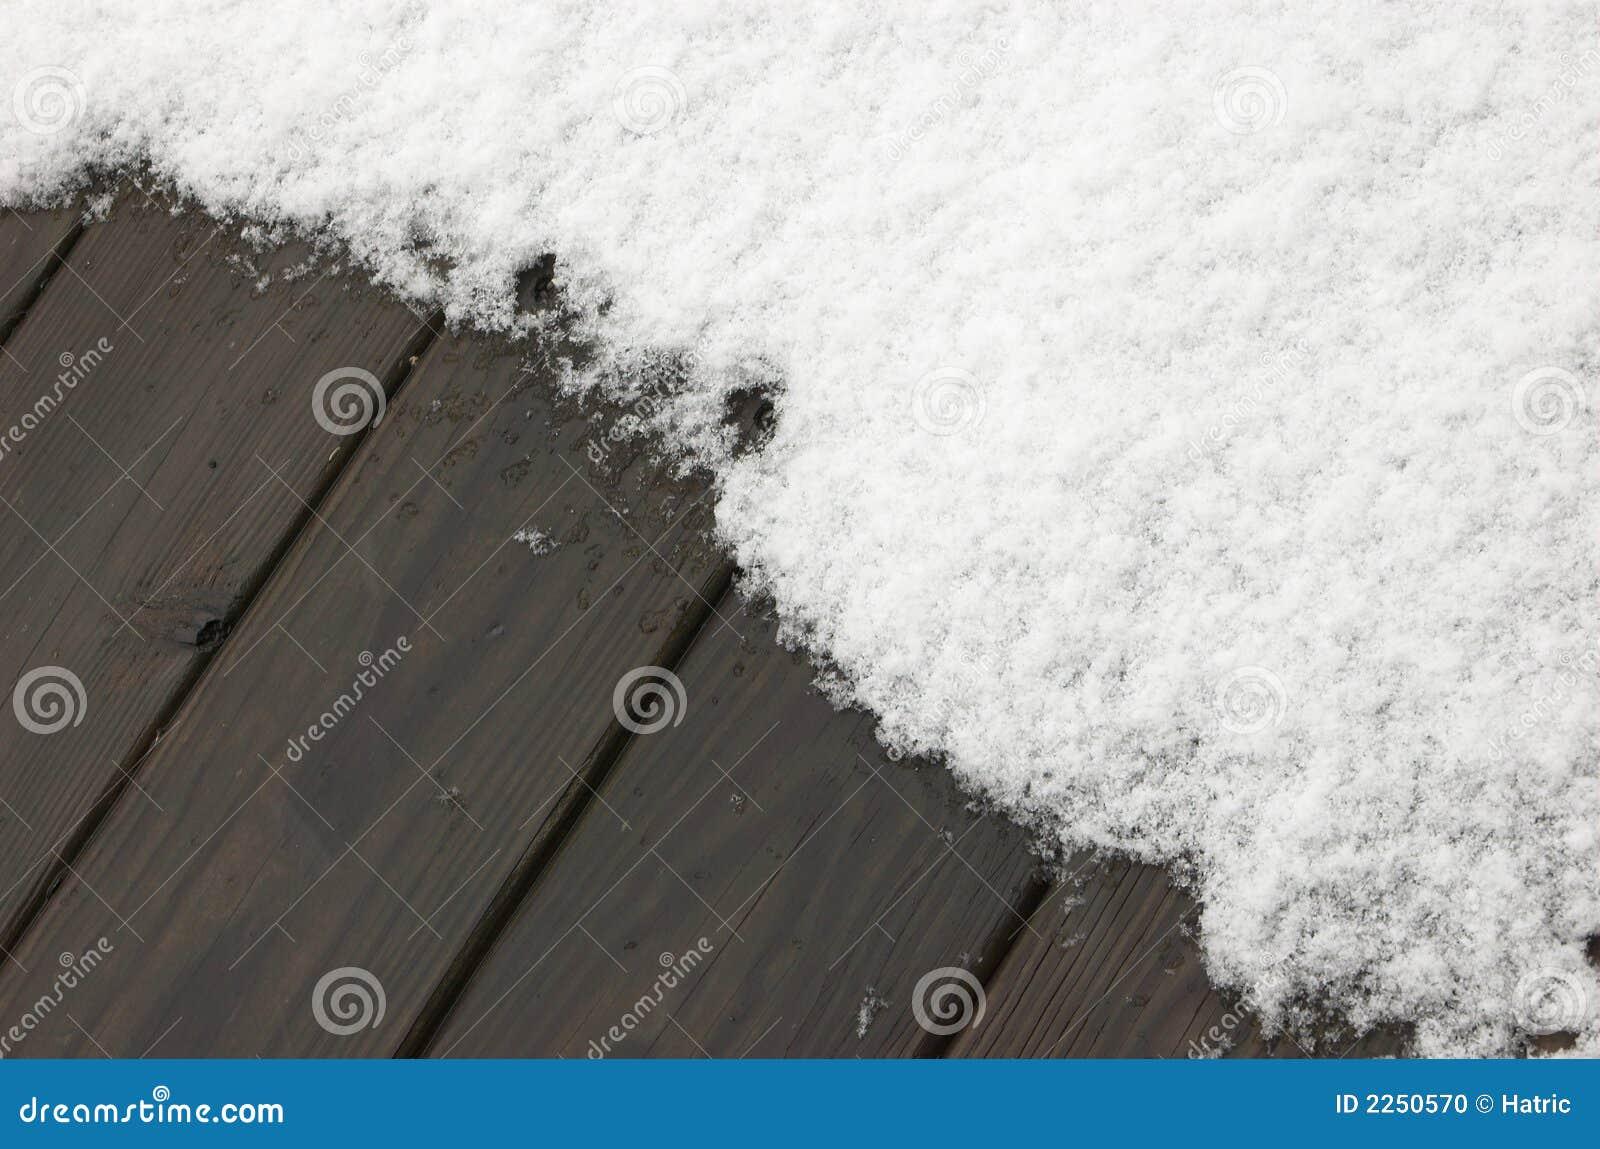 Background:snow on wooden deck